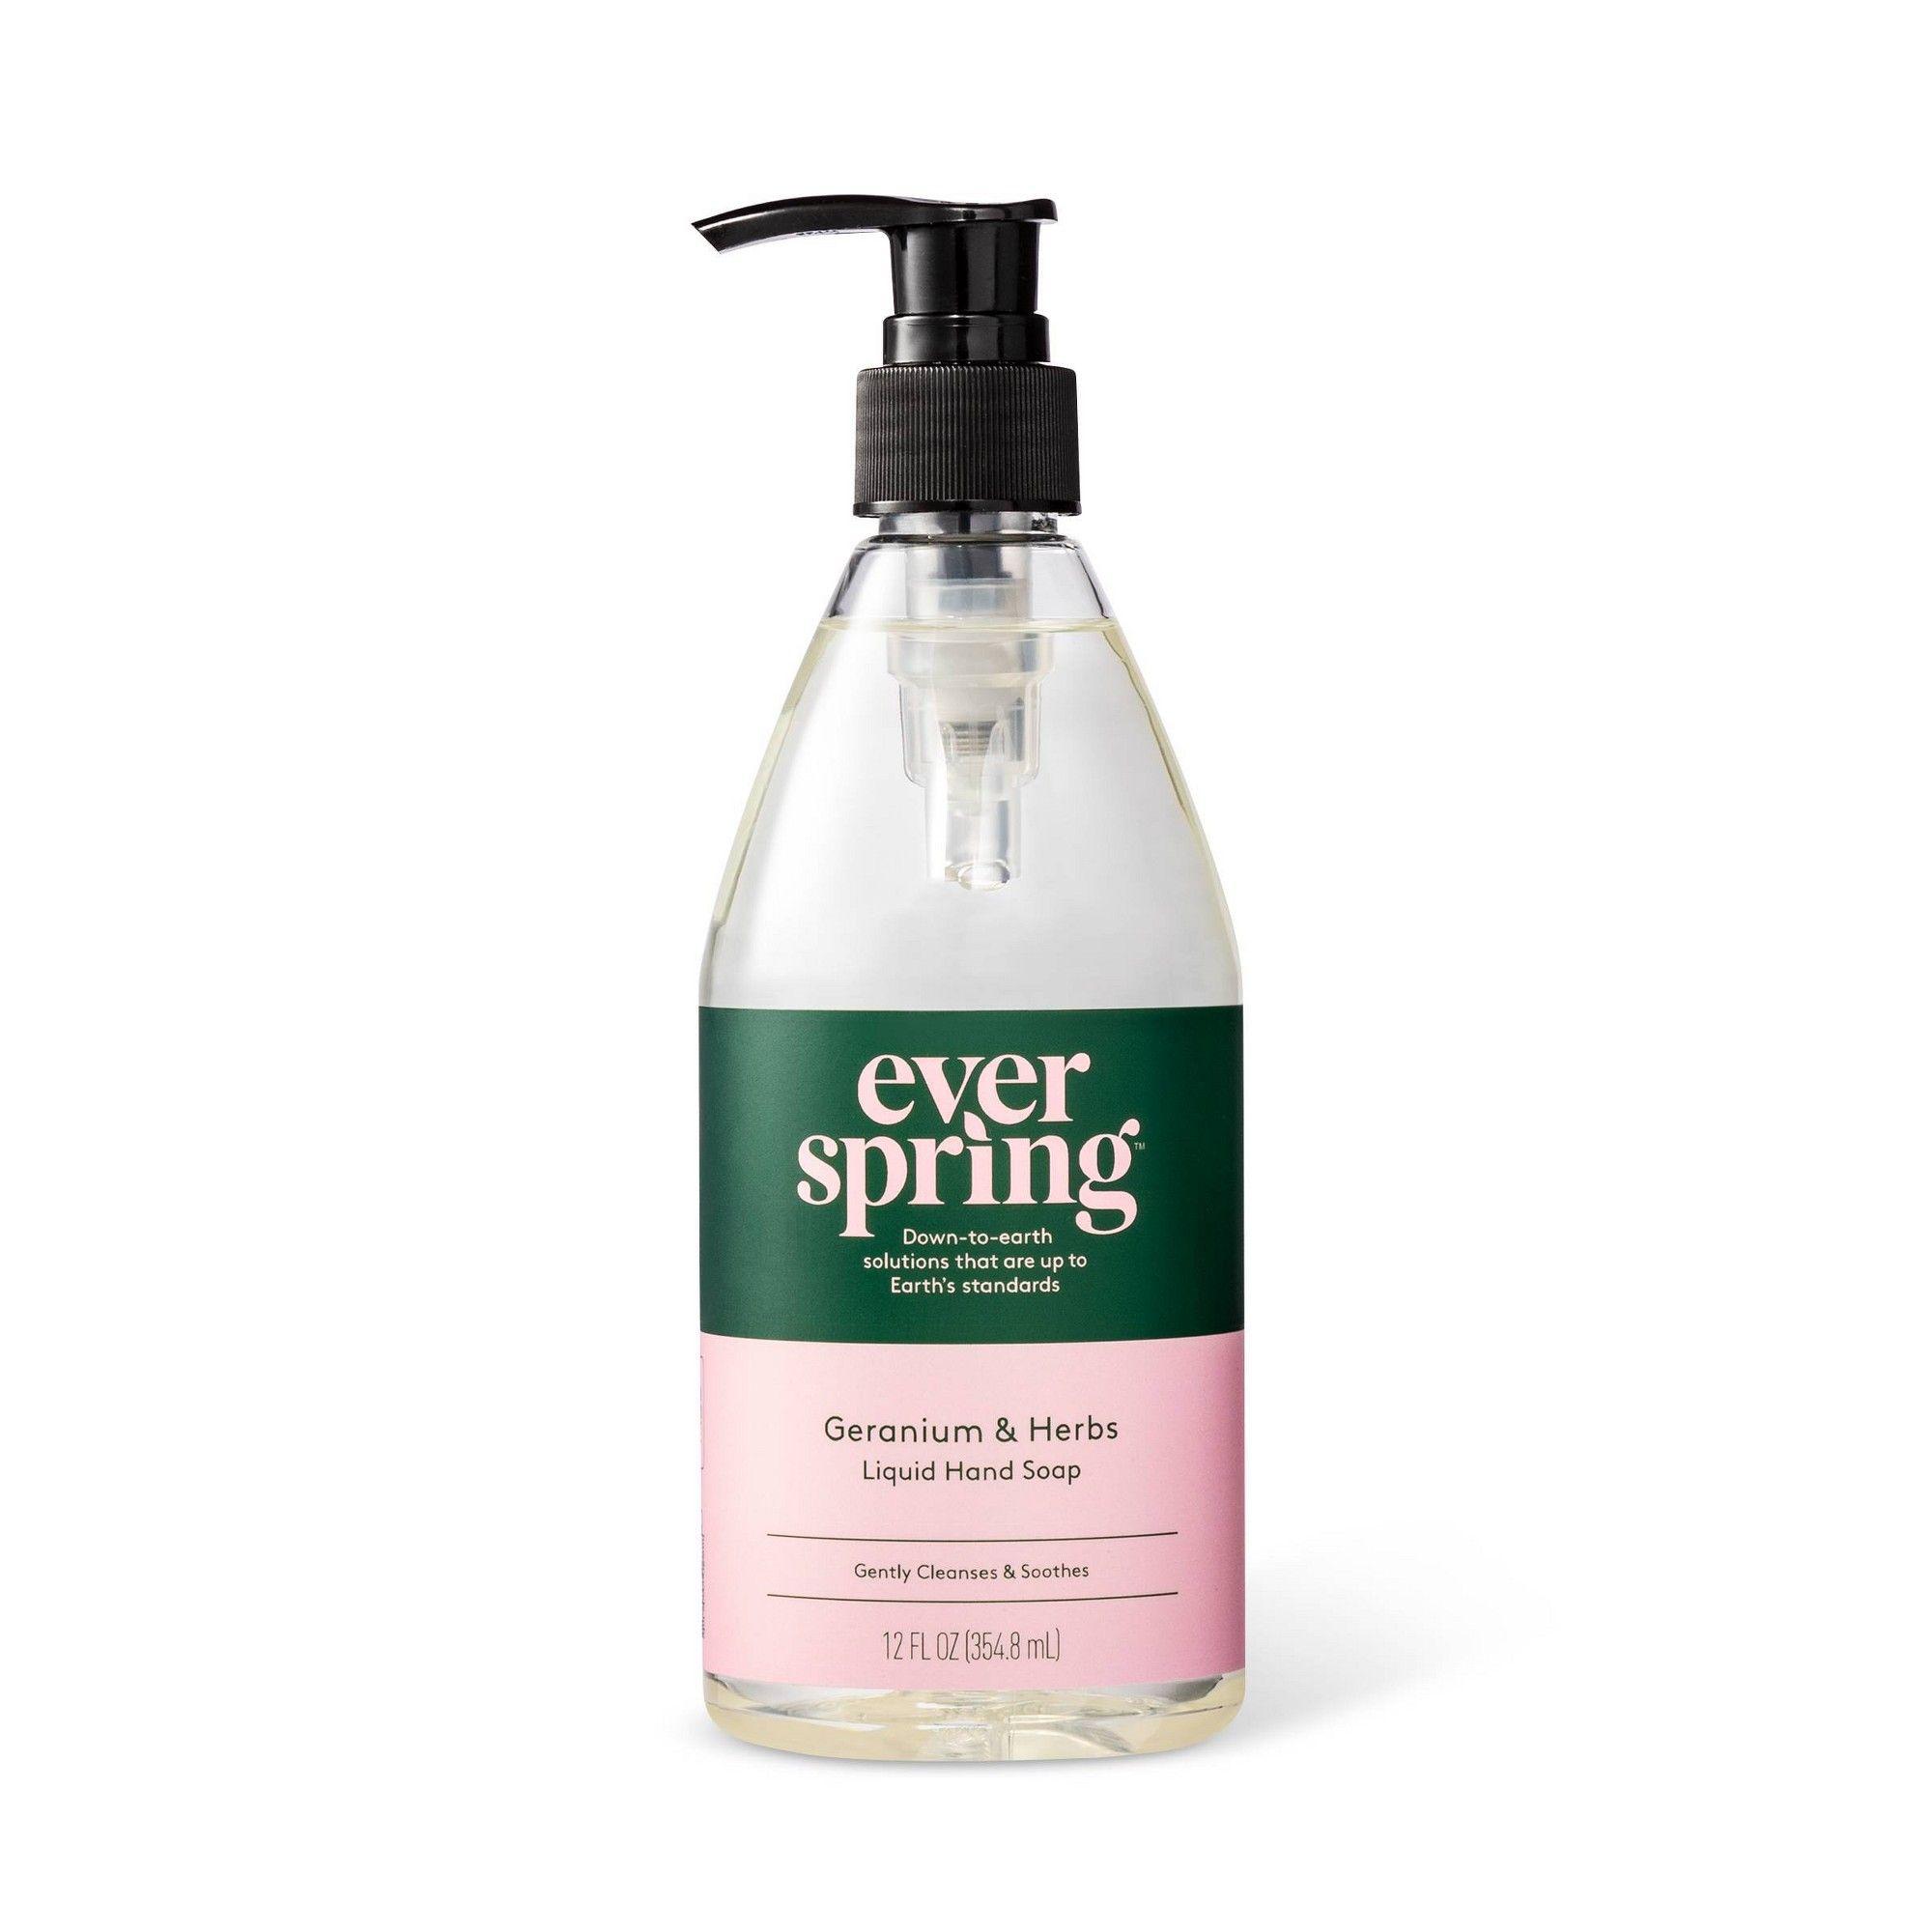 Geranium Herbs Liquid Hand Soap 12 Fl Oz Everspring Liquid